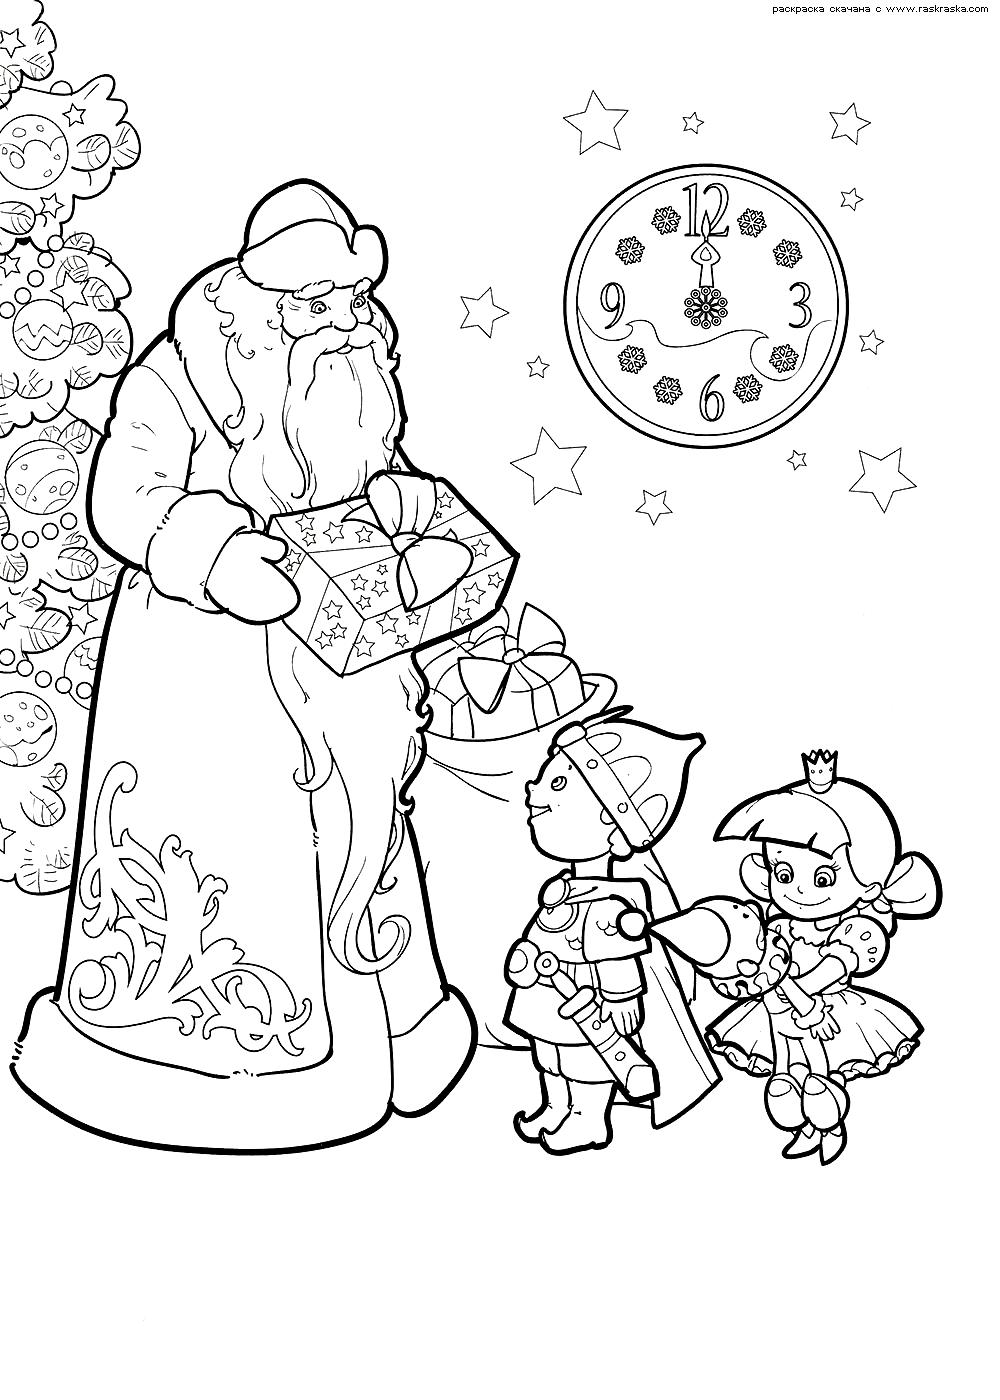 Раскраска Дед Мороз дарит подарки. Раскраска дед мороз, подарки